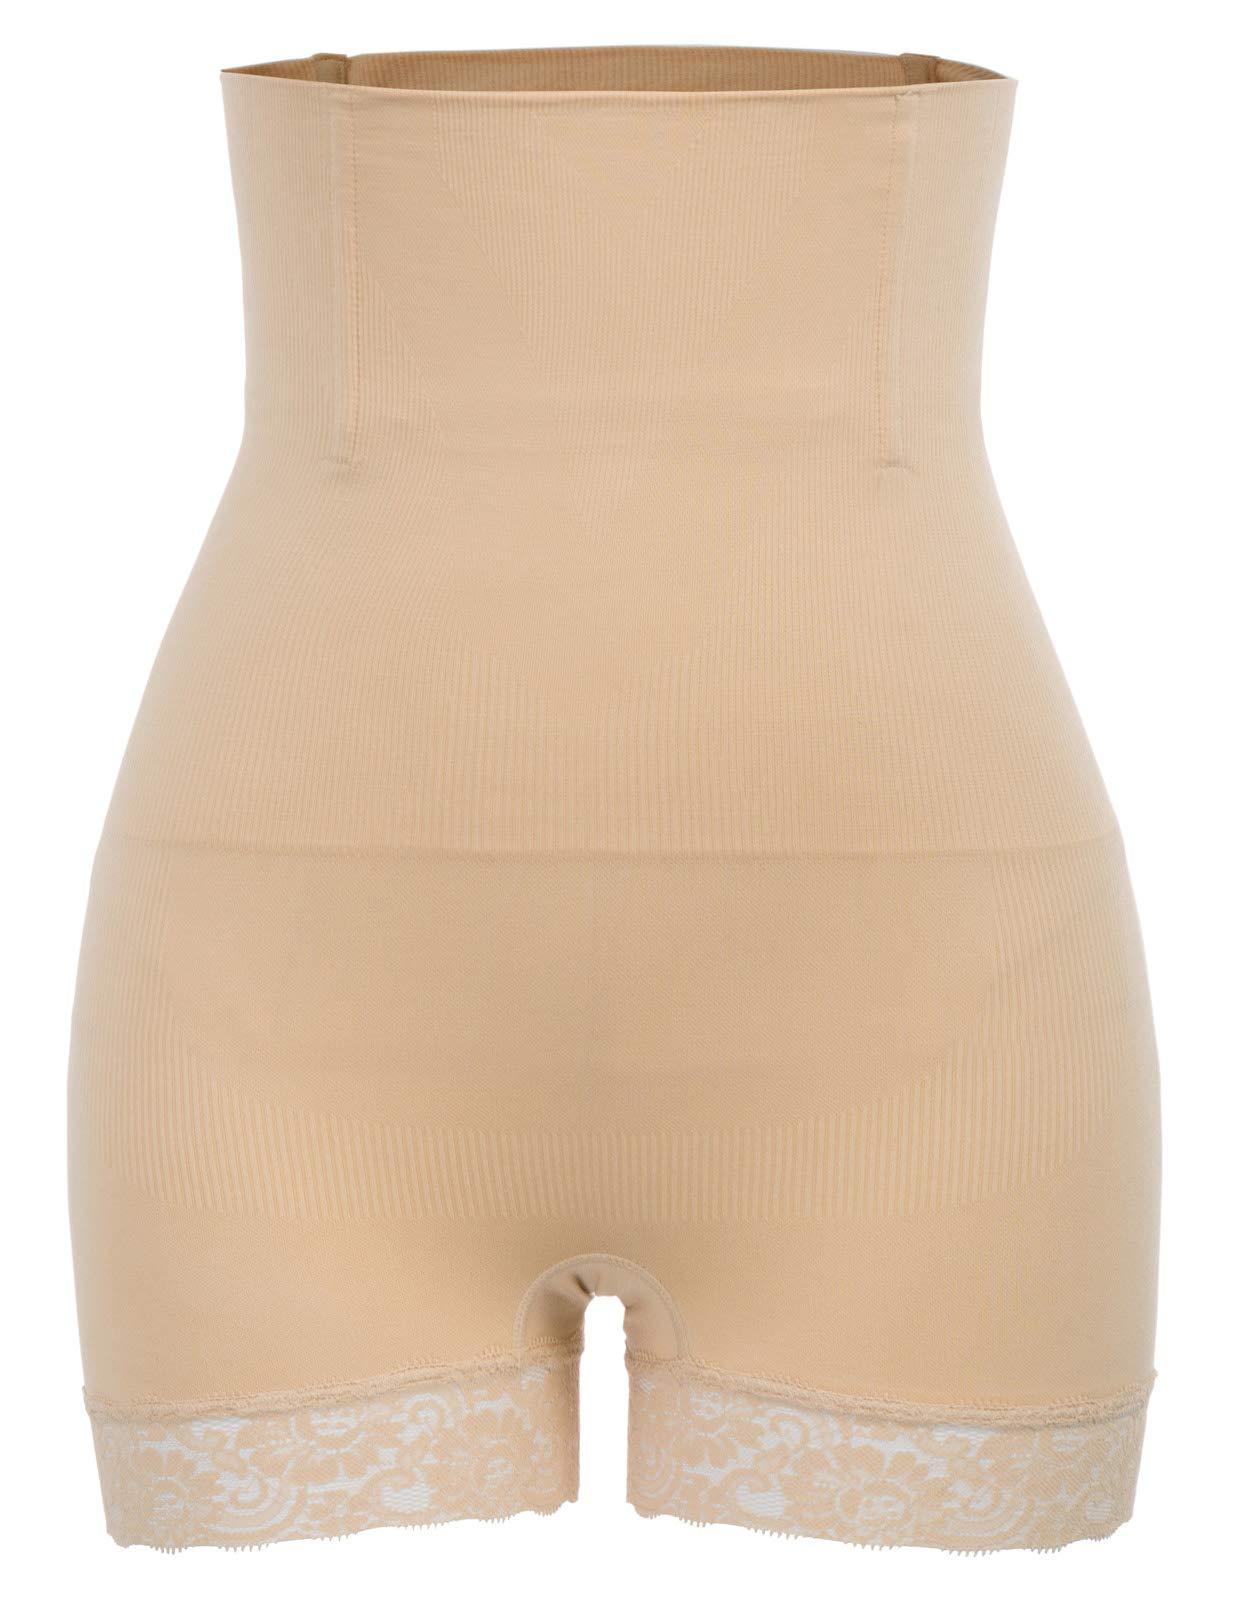 Zexxxy Women Body Shaper High Waist Butt Tummy Control Body Shaper Panty Slim Waist Trainer